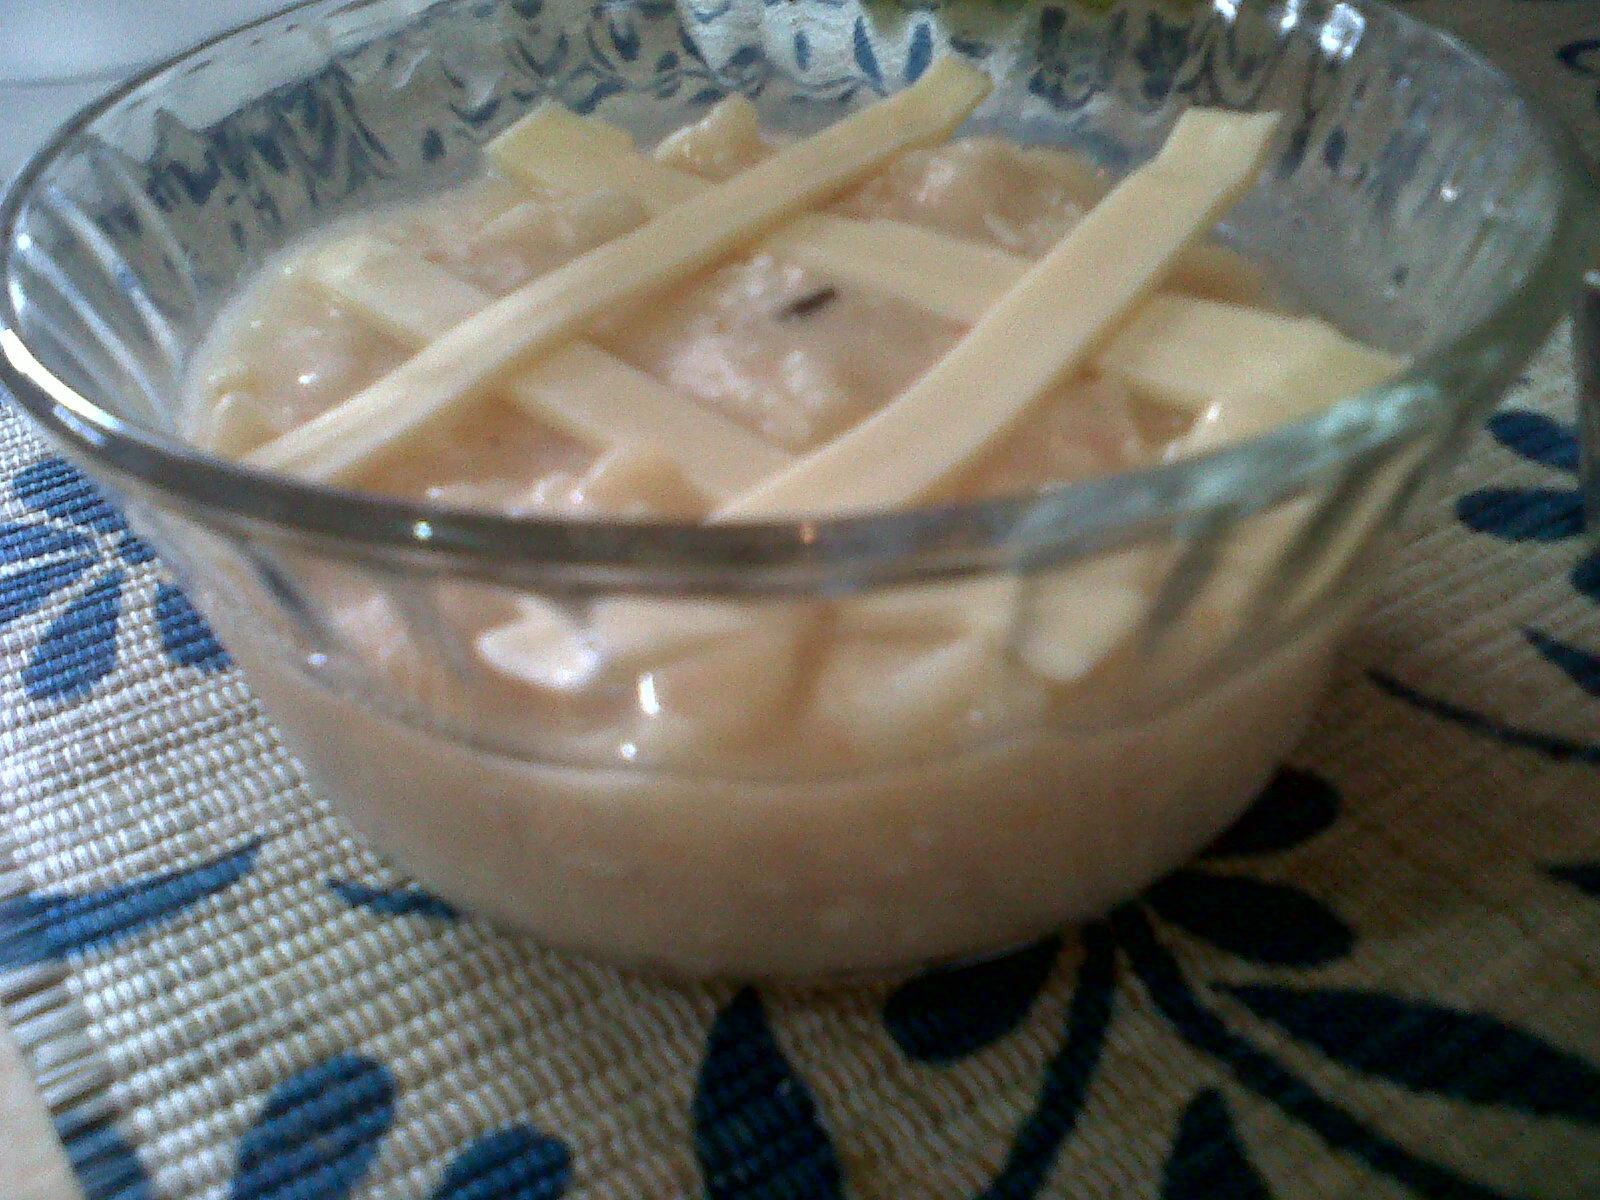 ibunyasalma: Creamy Macaroni & MacaroniBallen with Cheesy Melt